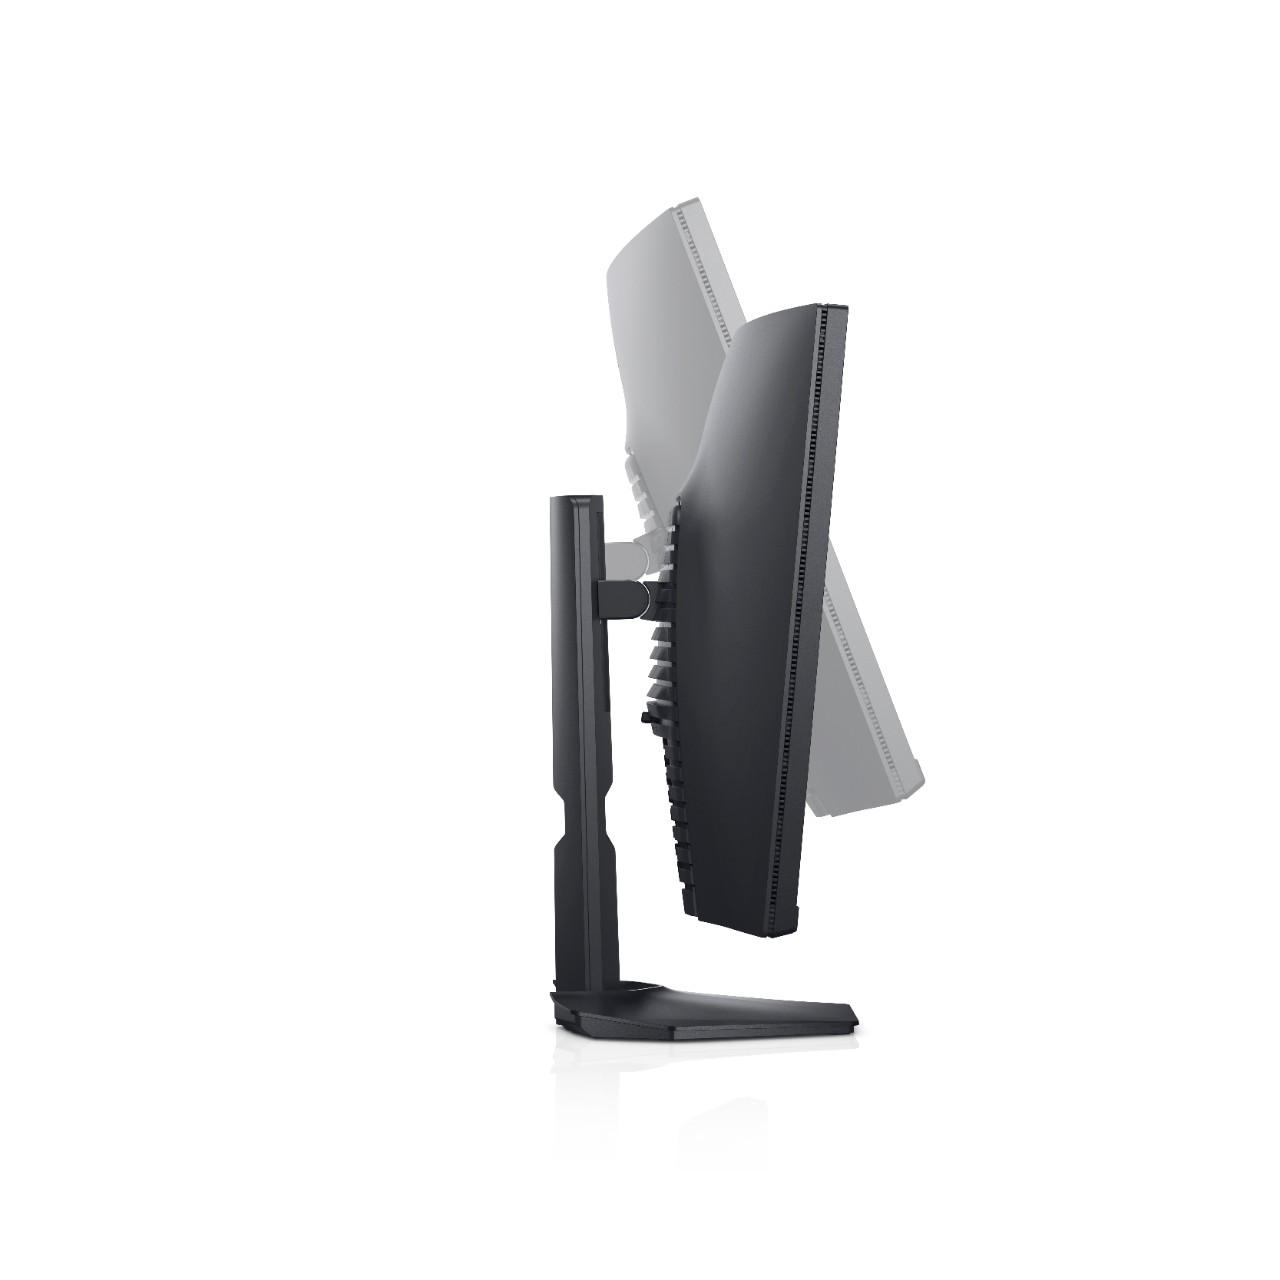 Dell S2721HGF Gaming Monitor